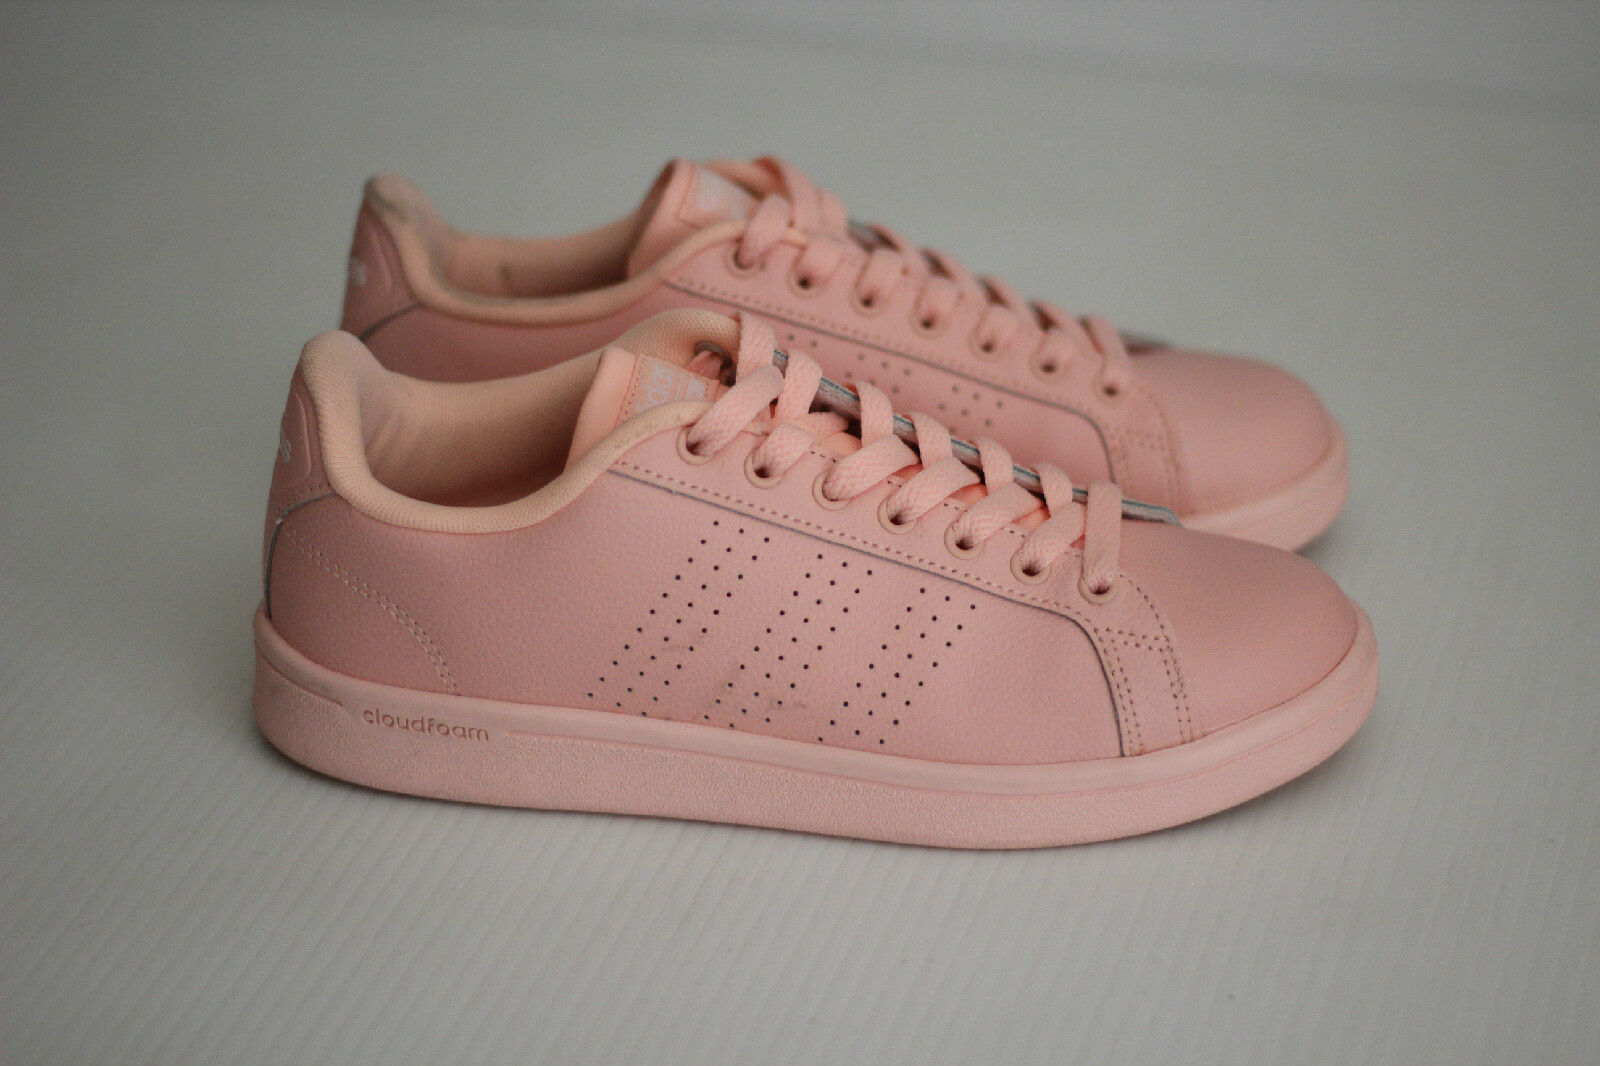 Adidas NEO Cloudfoam Advantage Clean Fashion Sneaker … - Gem